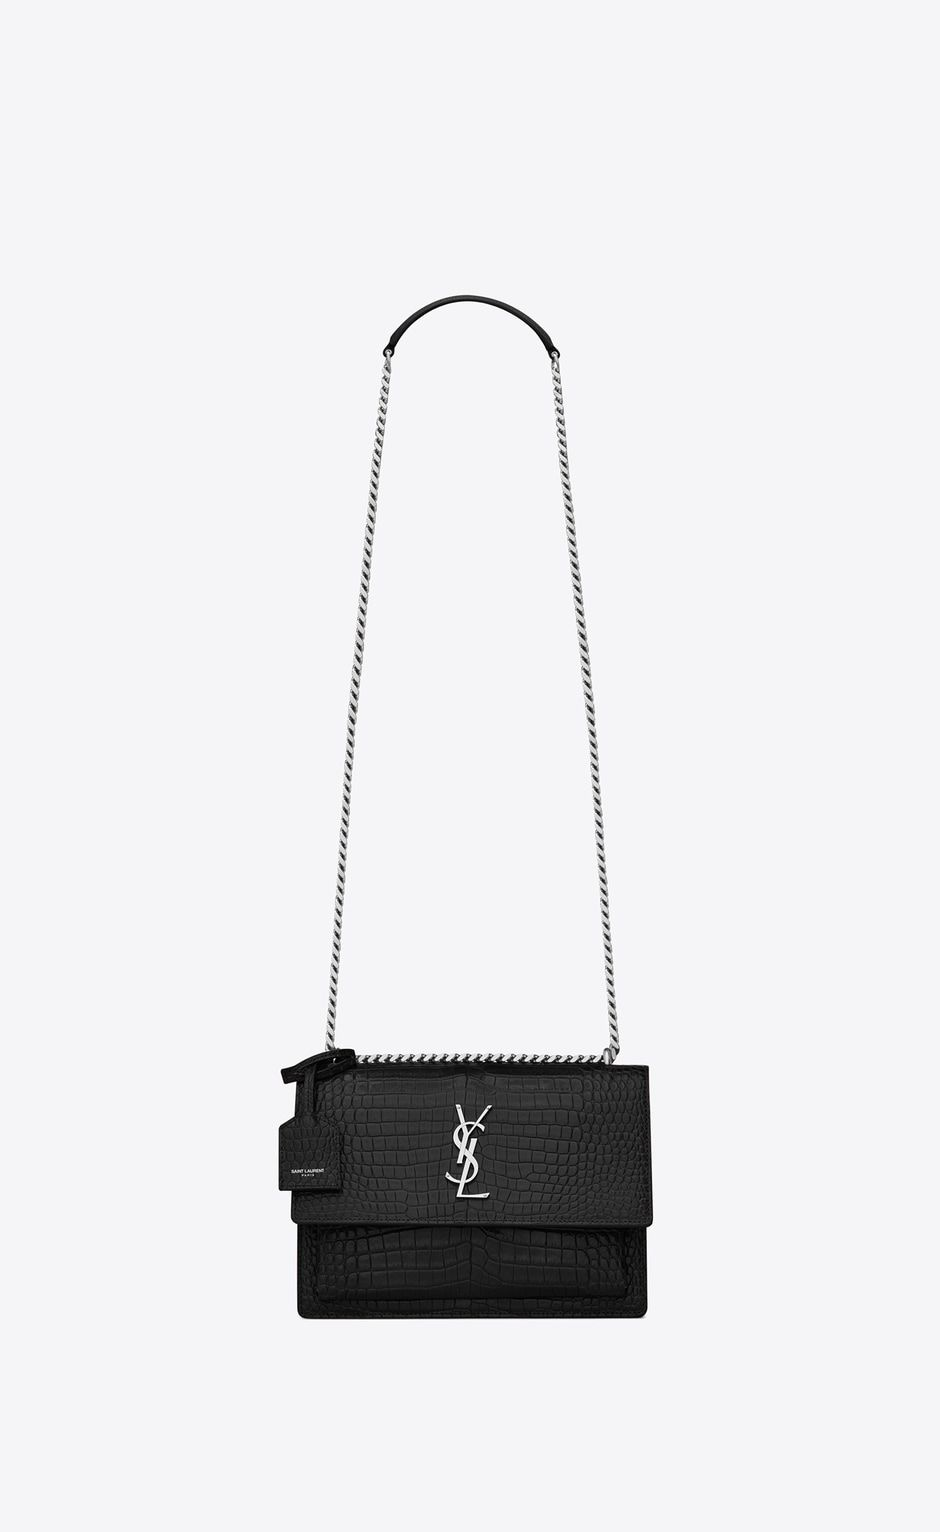 Medium Sunset Bag In Black Crocodile Embossed Shiny